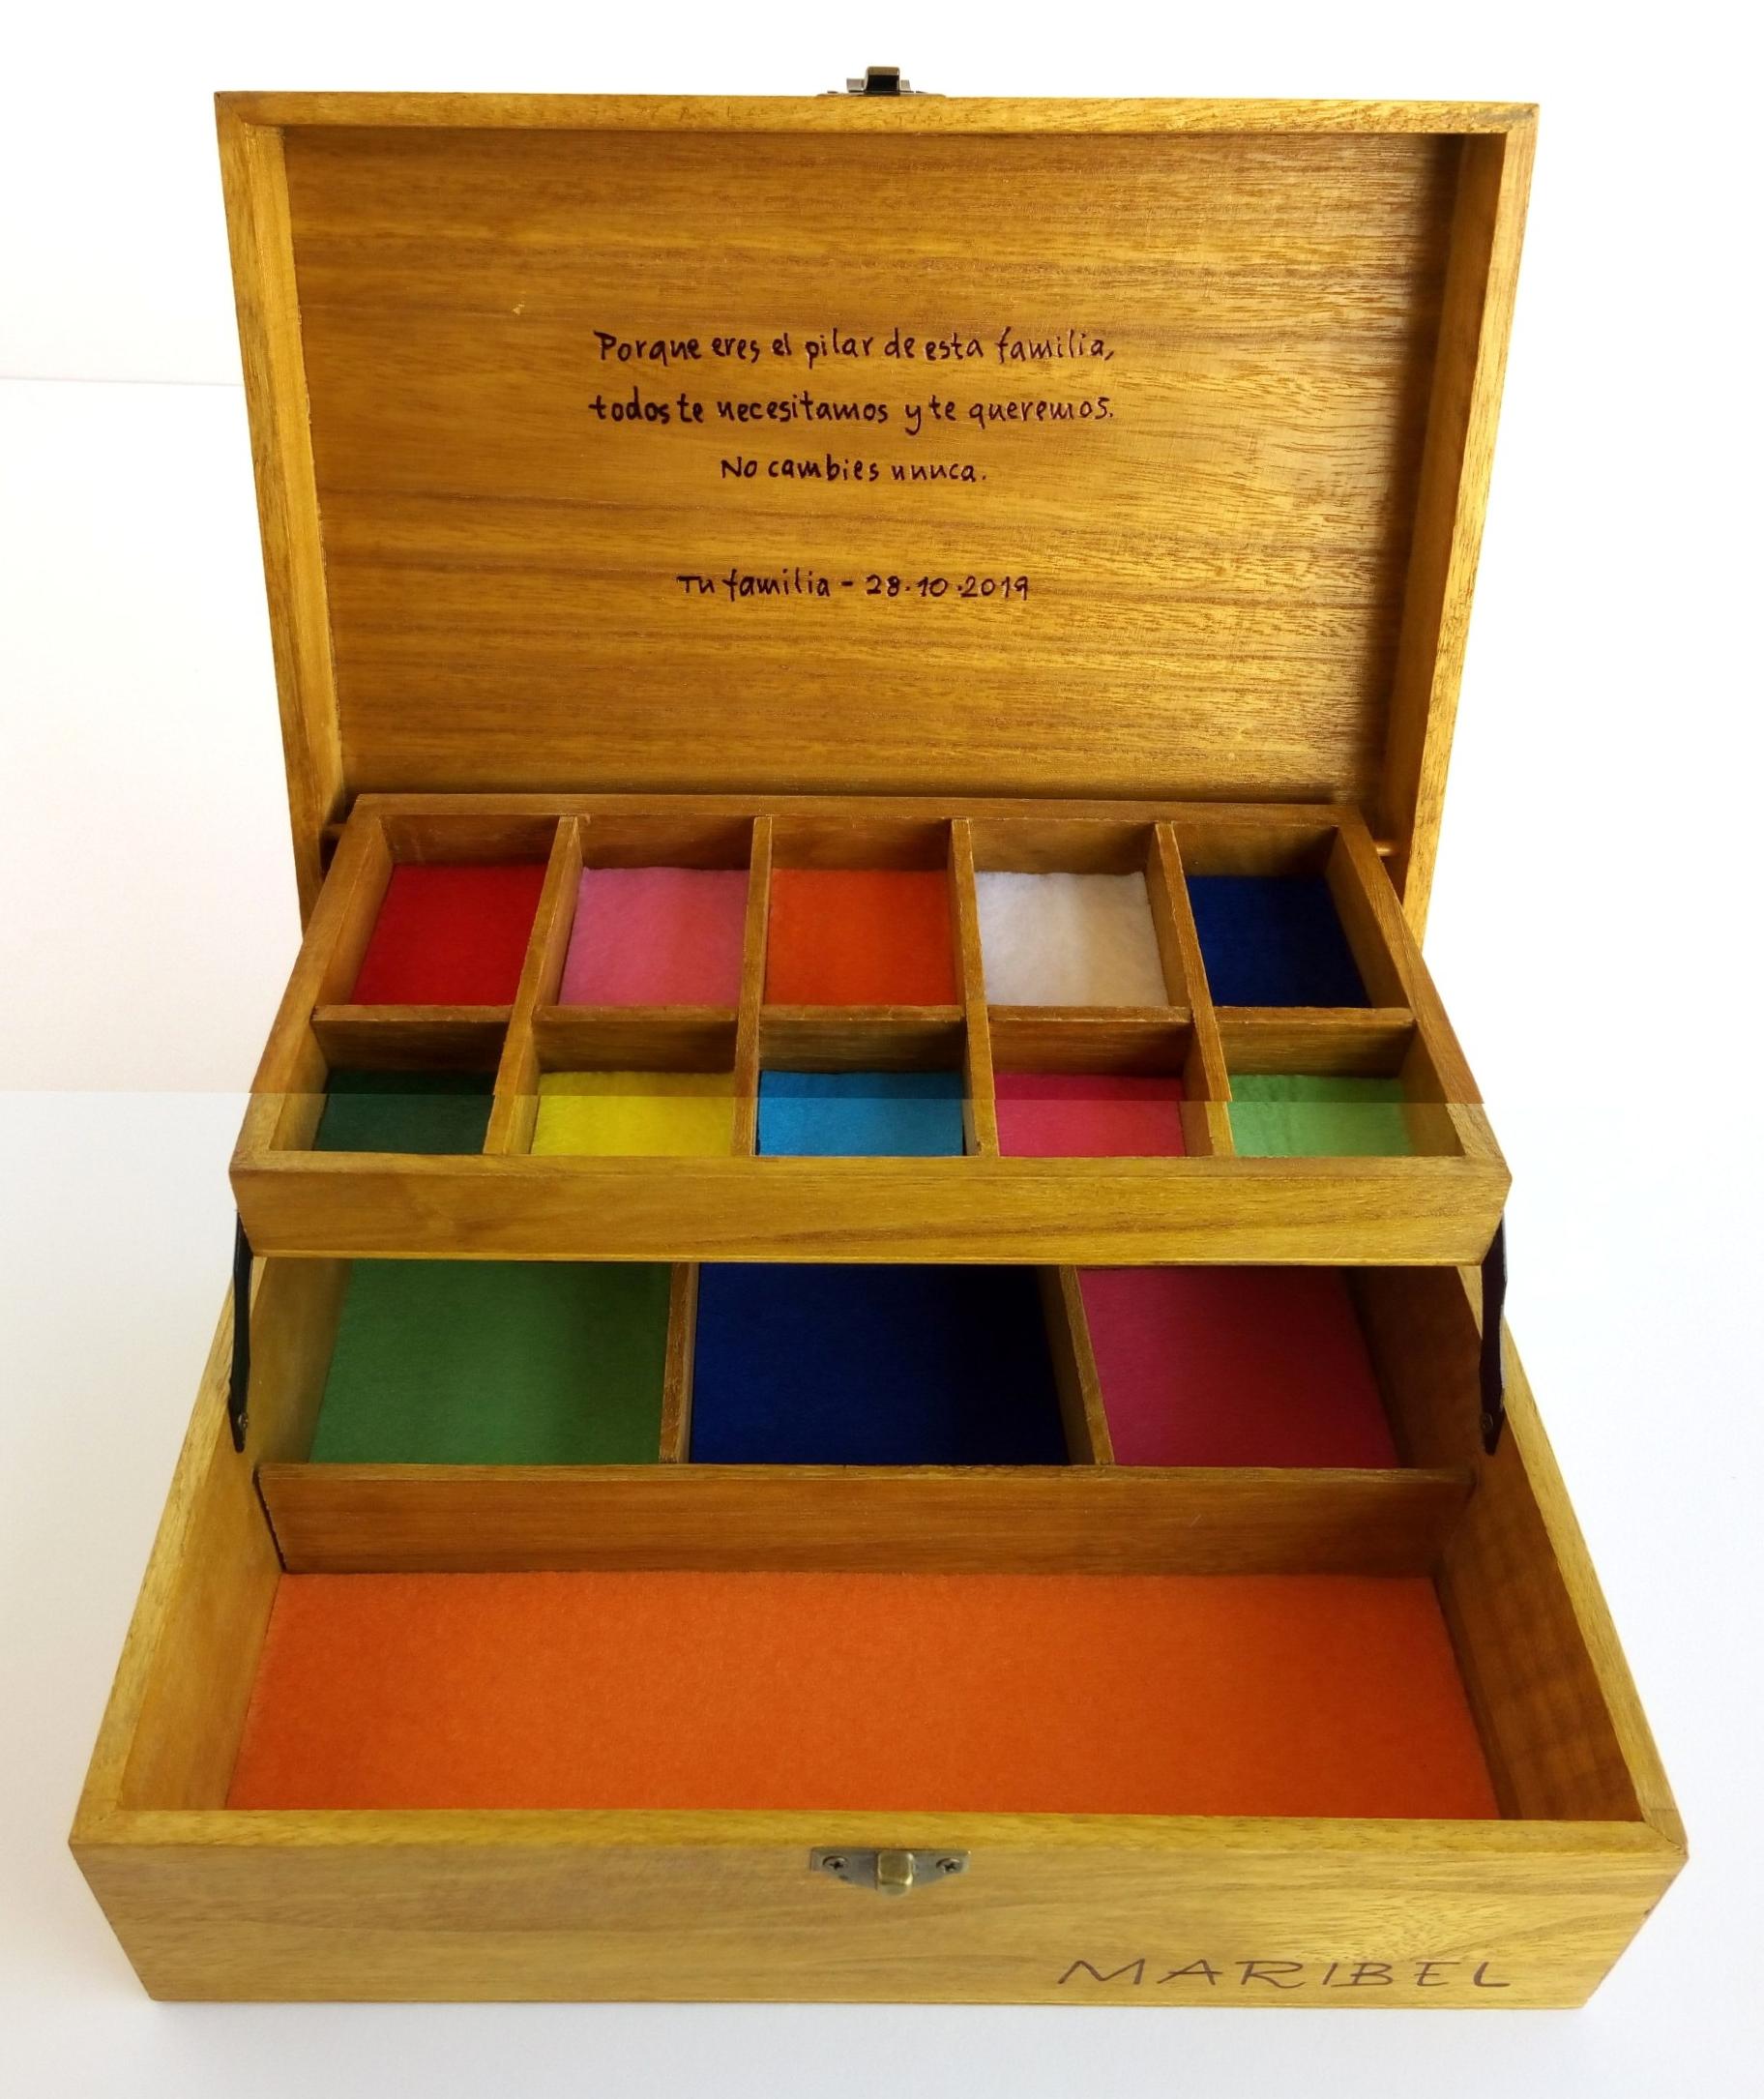 joyero de madera personalizado